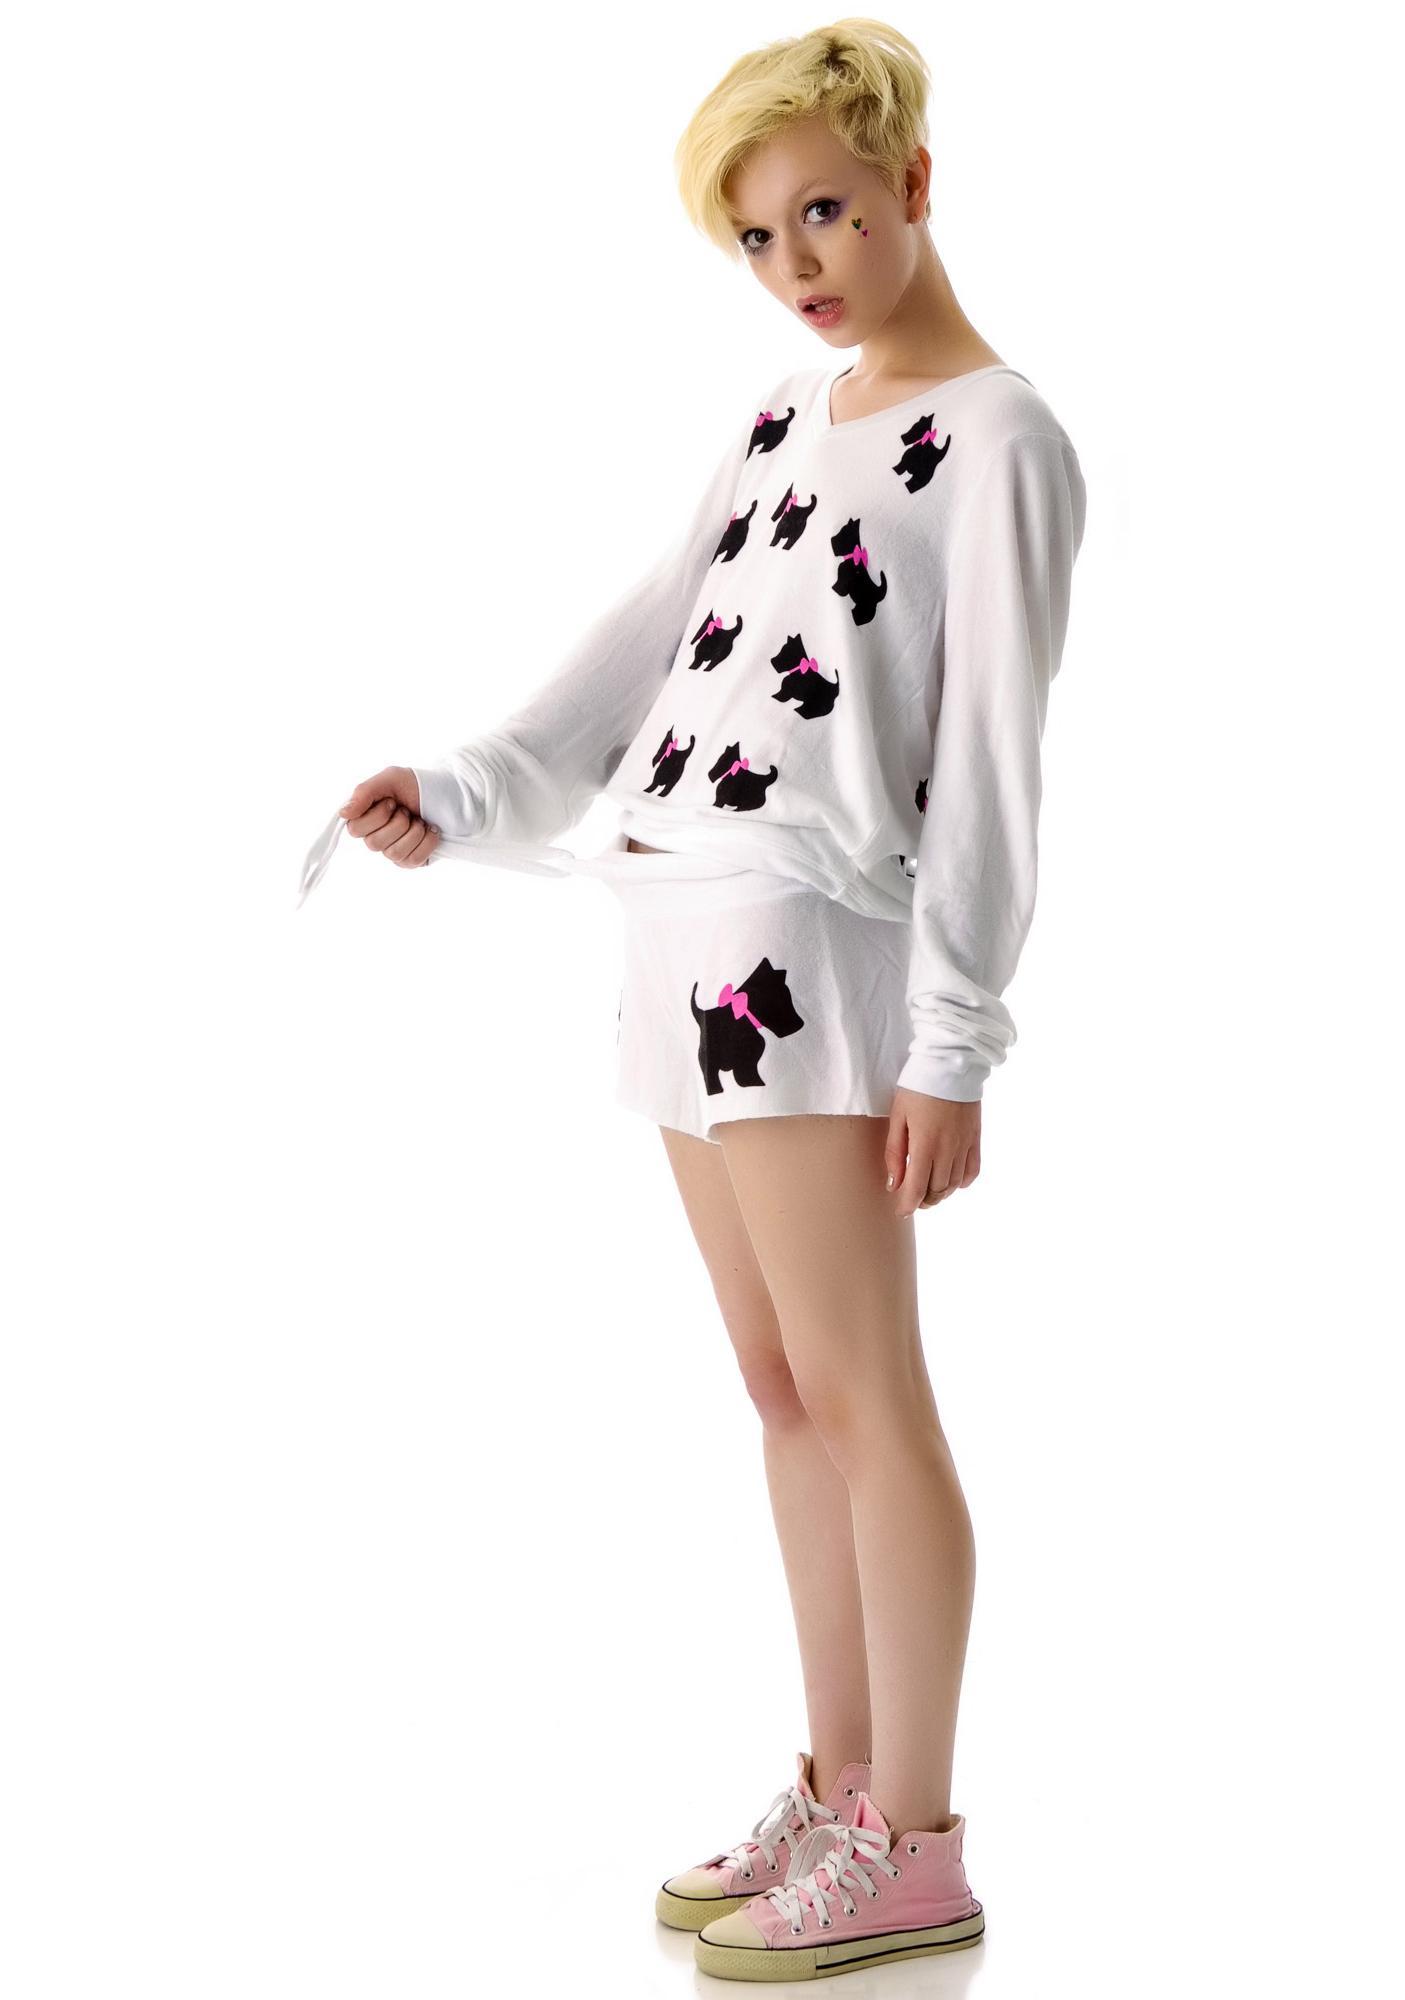 Wildfox Couture Black Doggie Cutie Shorts